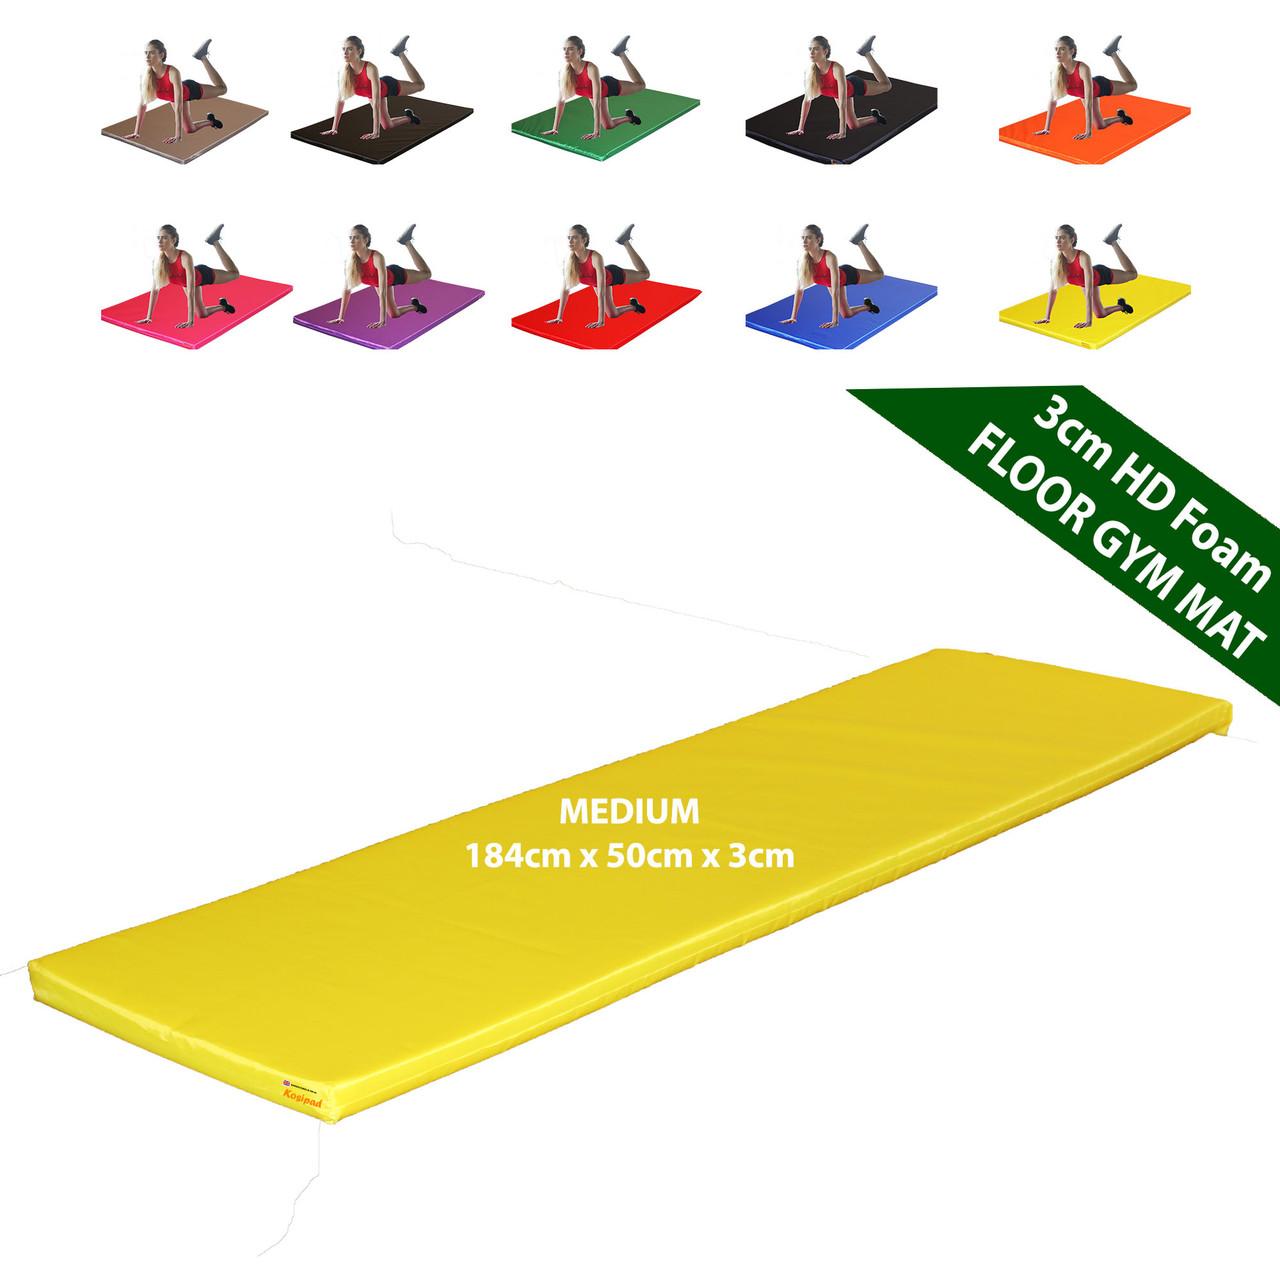 Kosipad 3cm Thick foam floor gym crash mats Yellow Blue Medium 3